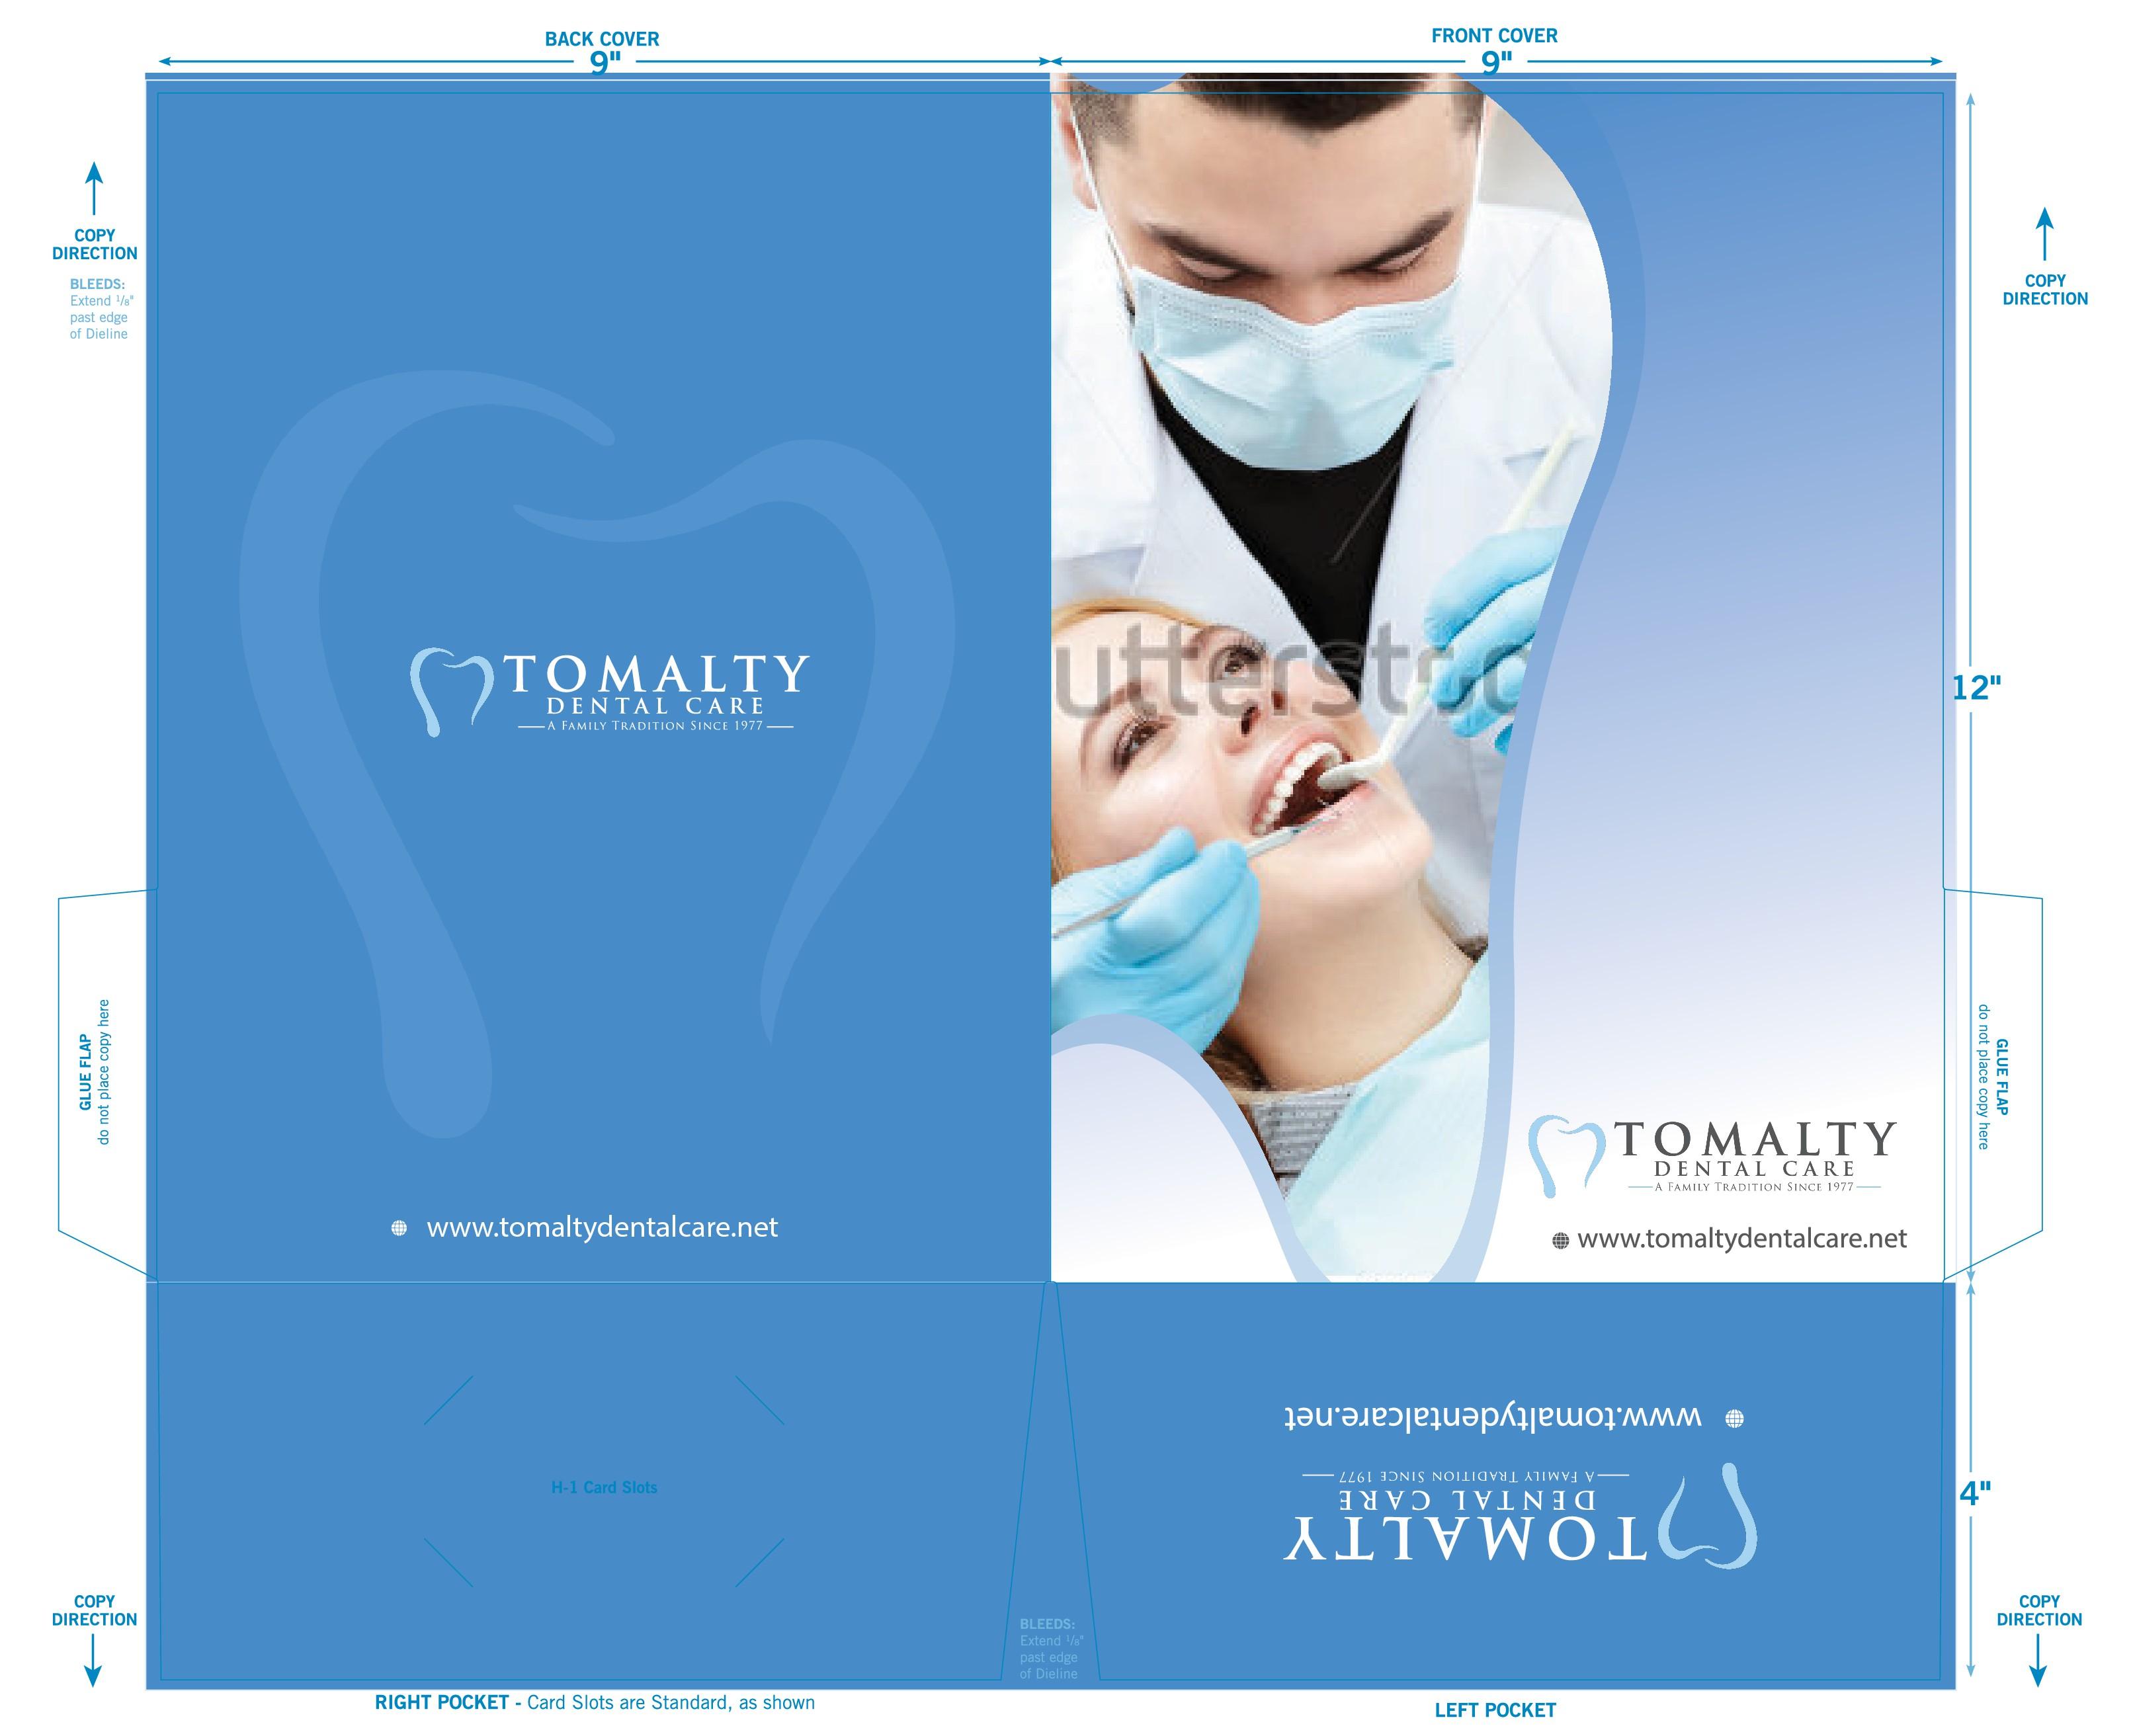 Acqusition Folder-Tomalty Dental Care